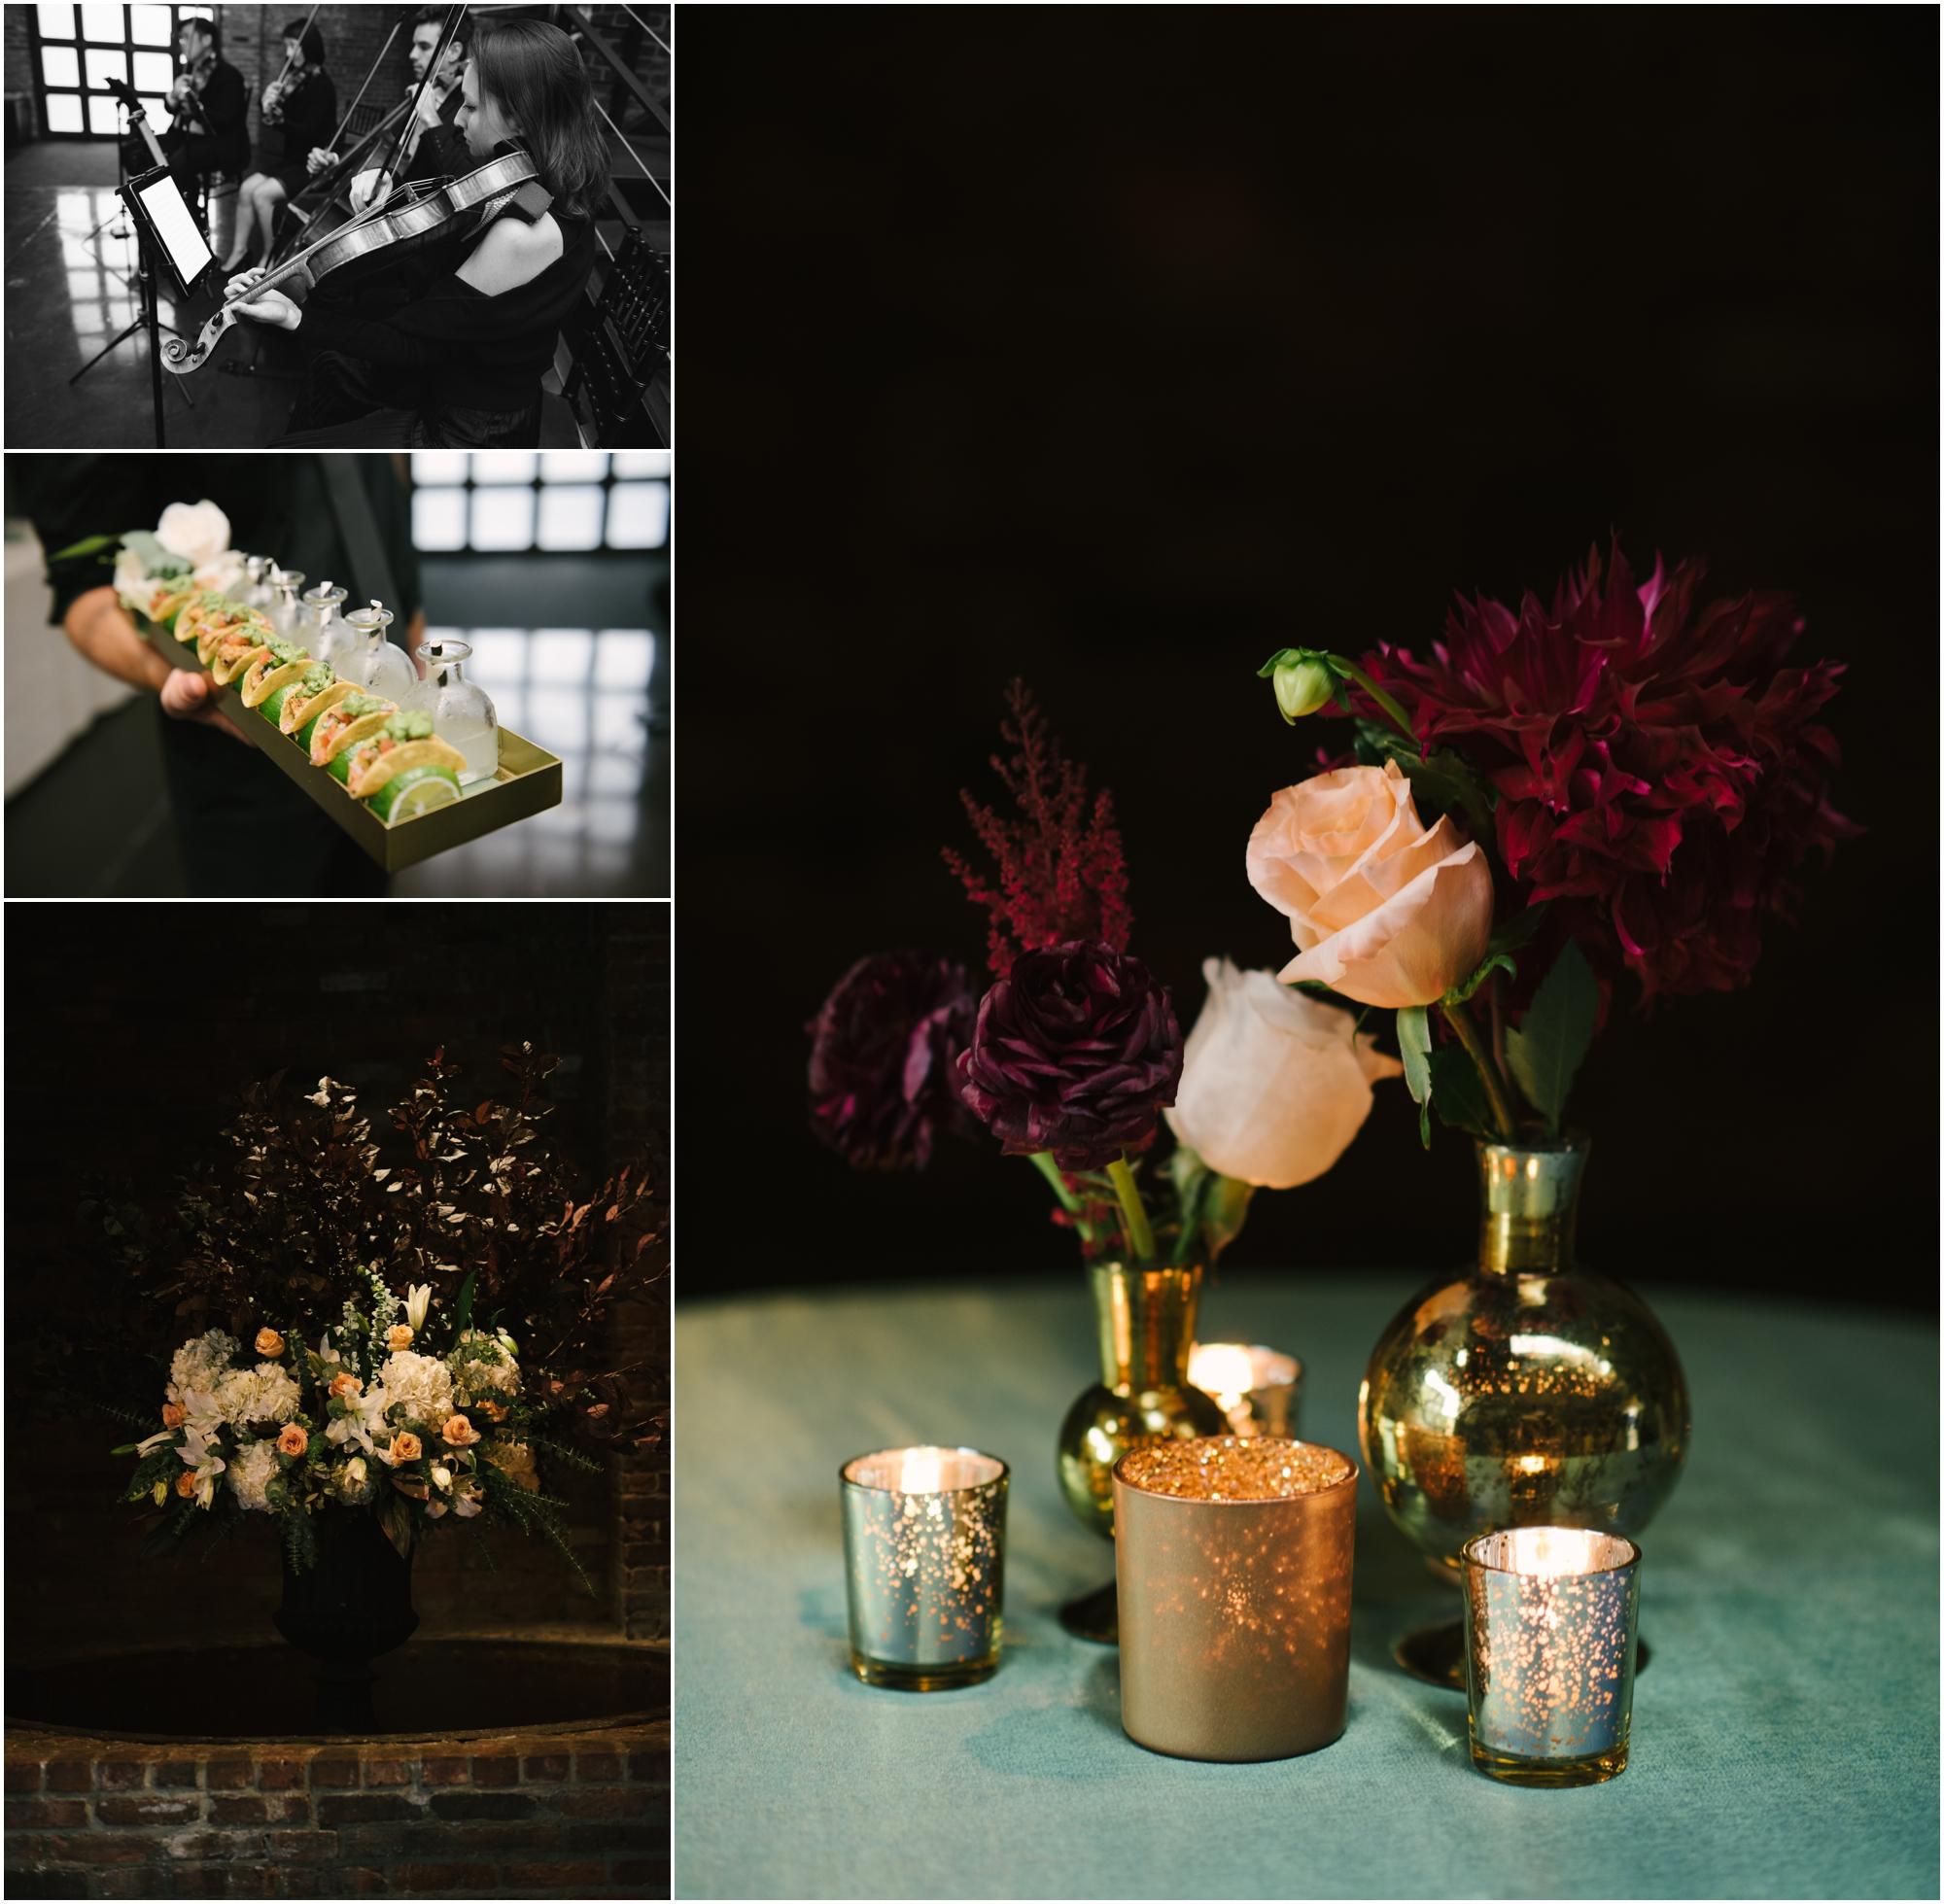 gay-wedding-photographer-williamsburgphotostudios-thefoundry-wedding-photographer_0026.jpg